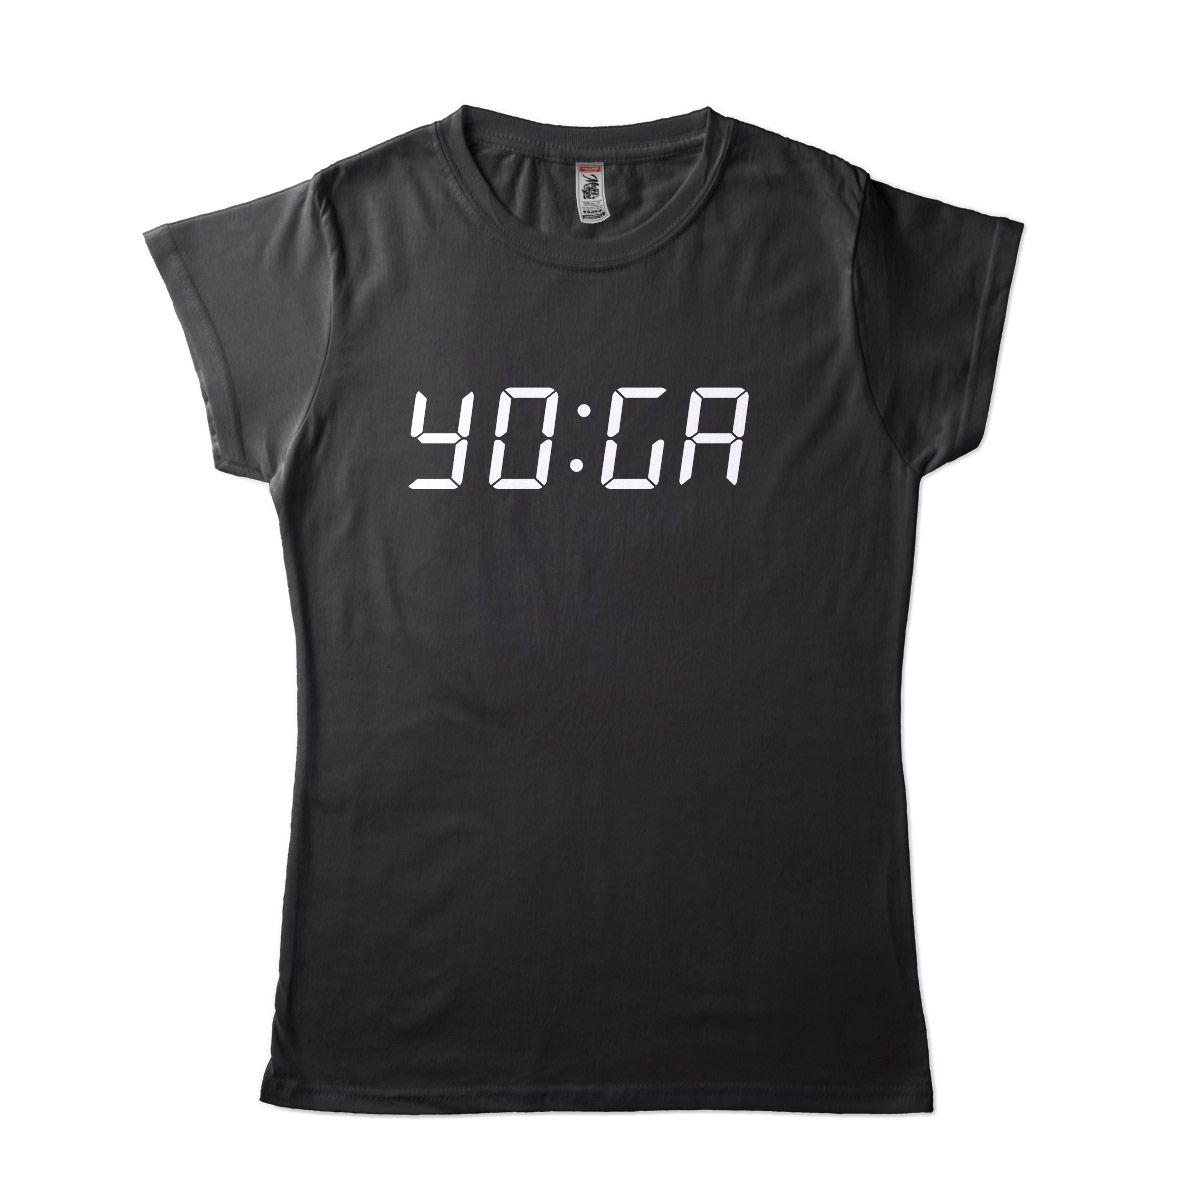 Camisa Feminina Hora para Yoga Relógio Preta